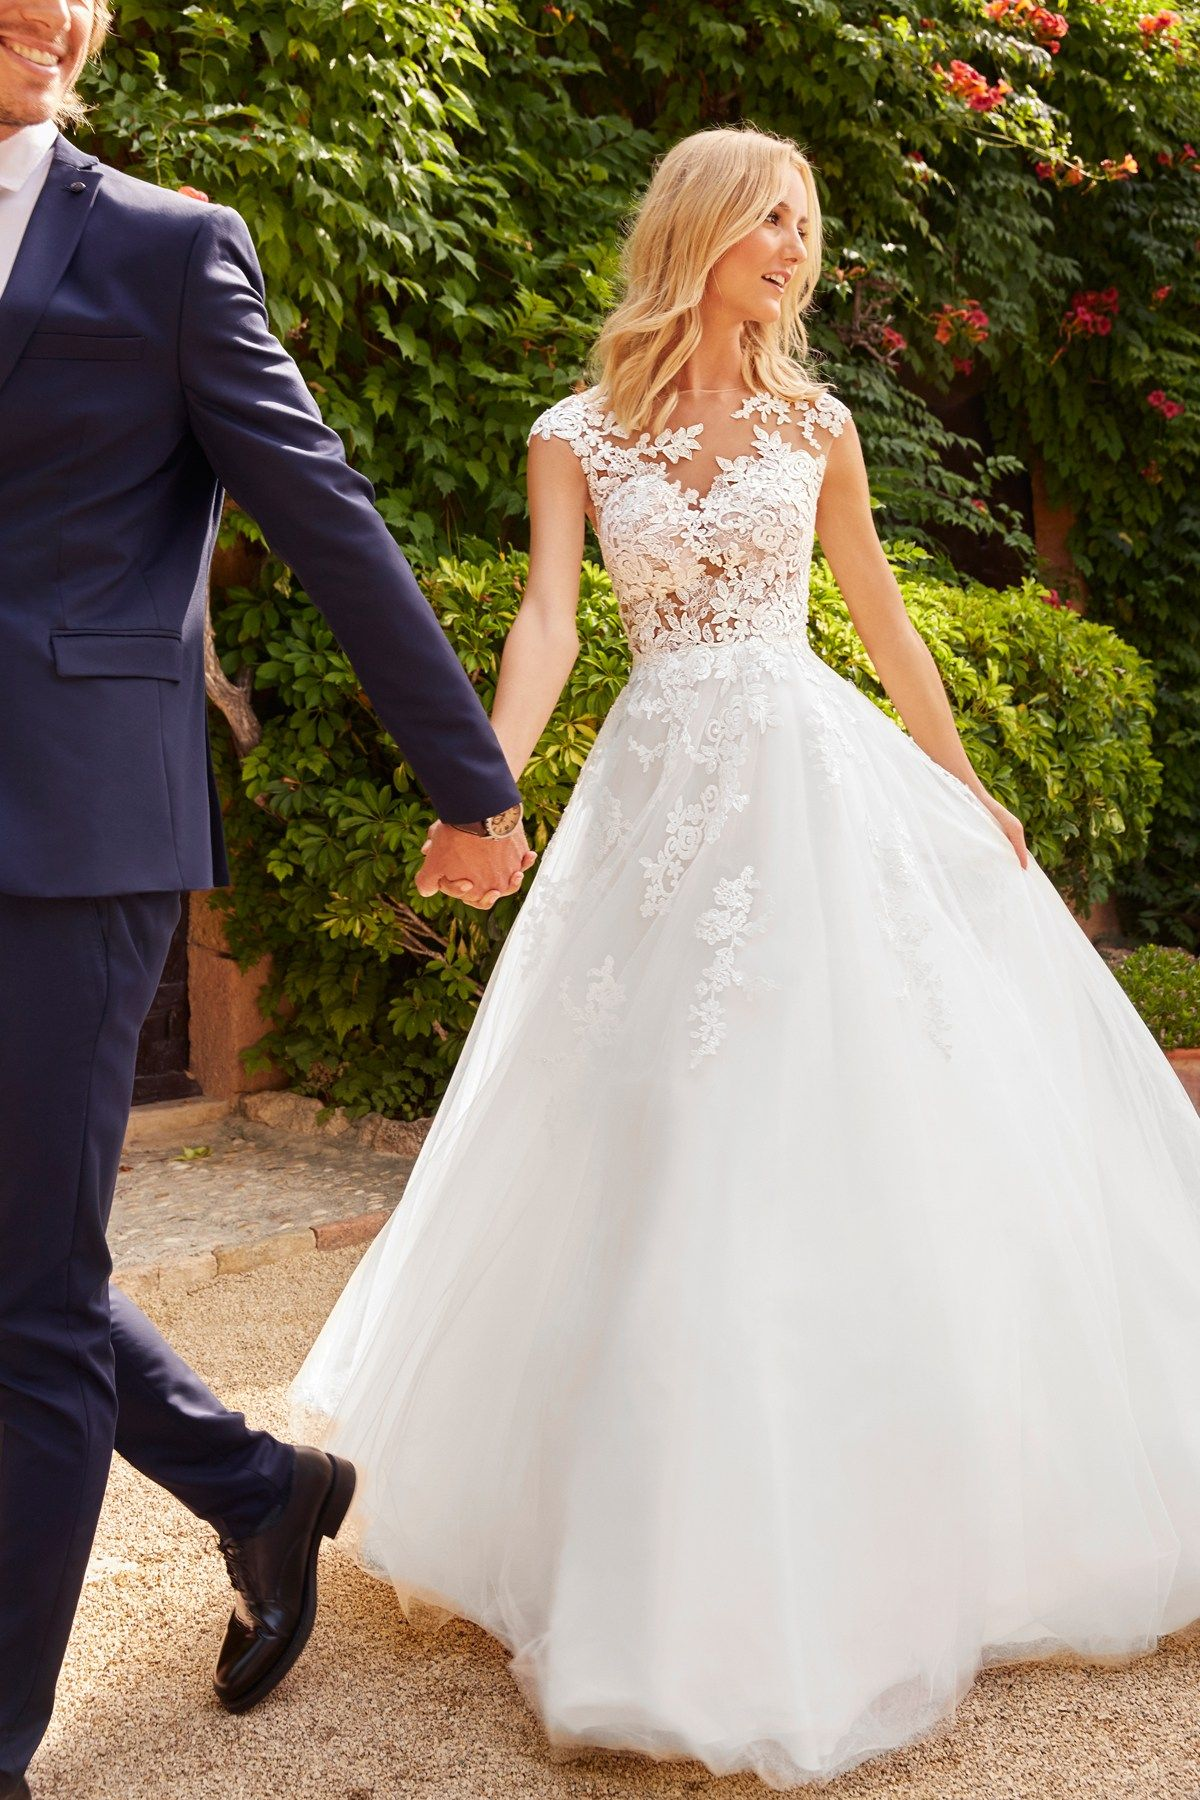 Photo of Fresh & Modern Bridalwear – Introducing White One Collection By St. Patrick | Love My Dress® UK Wedding Blog + Wedding Directory